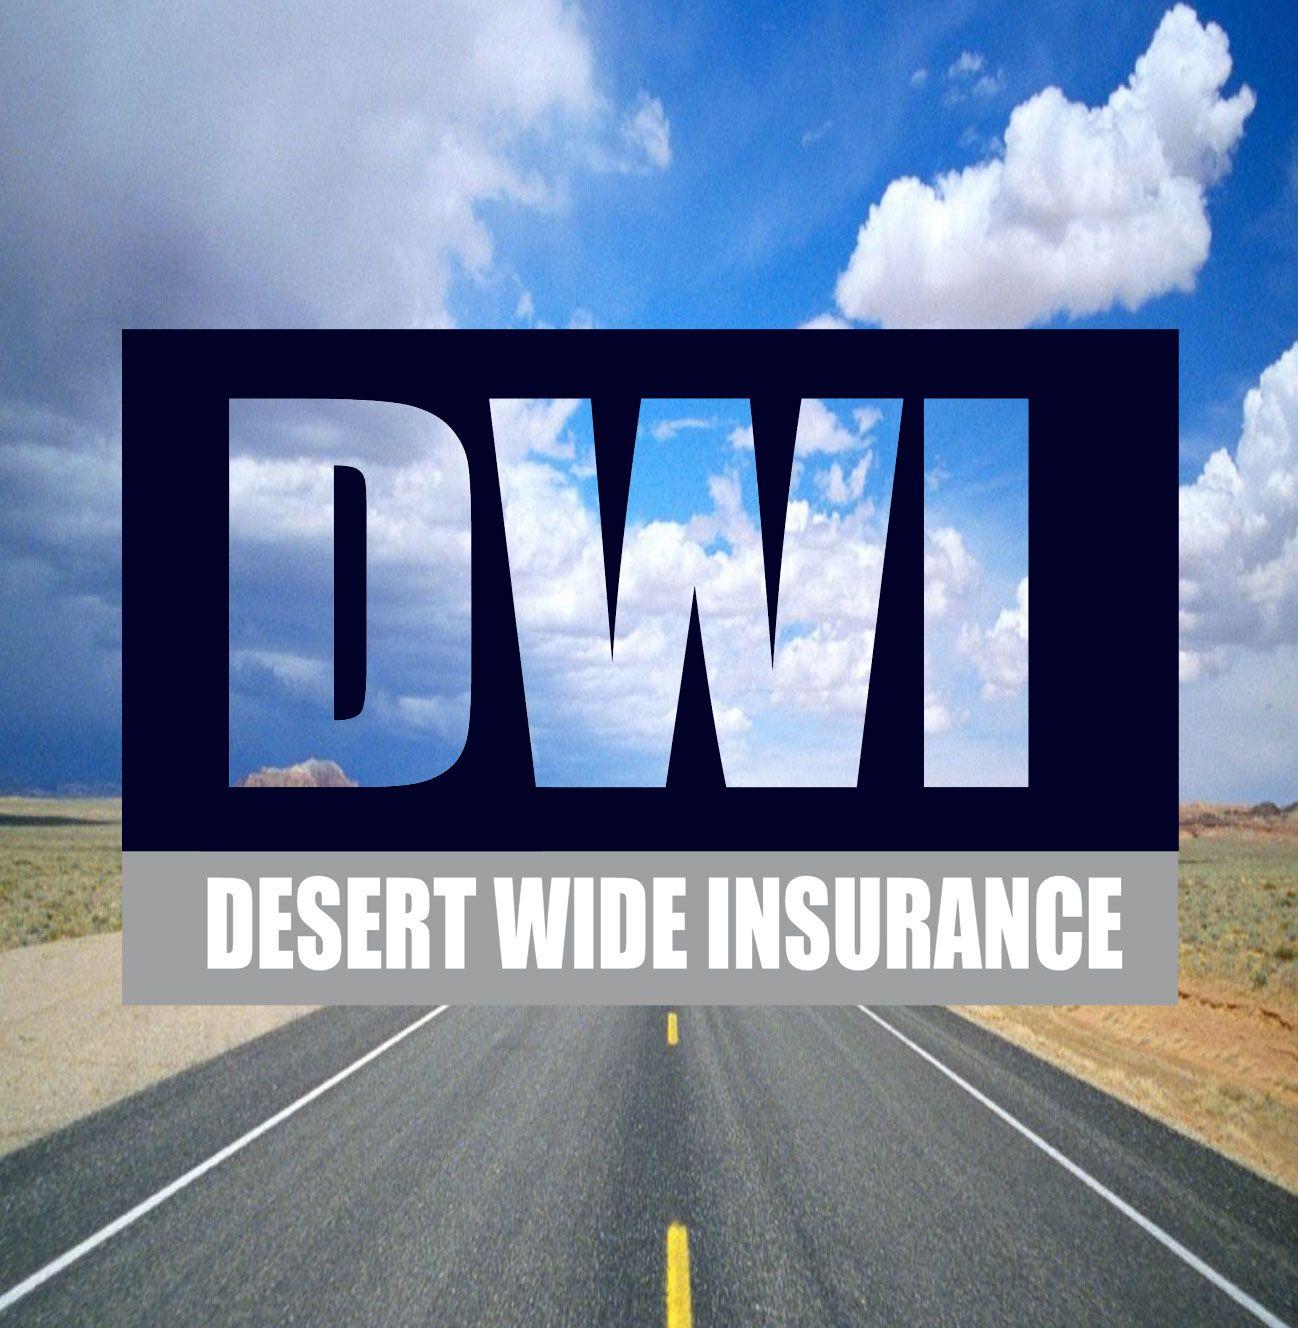 Desert Wide Insurance Provides Arizona Car Insurance We Shop With